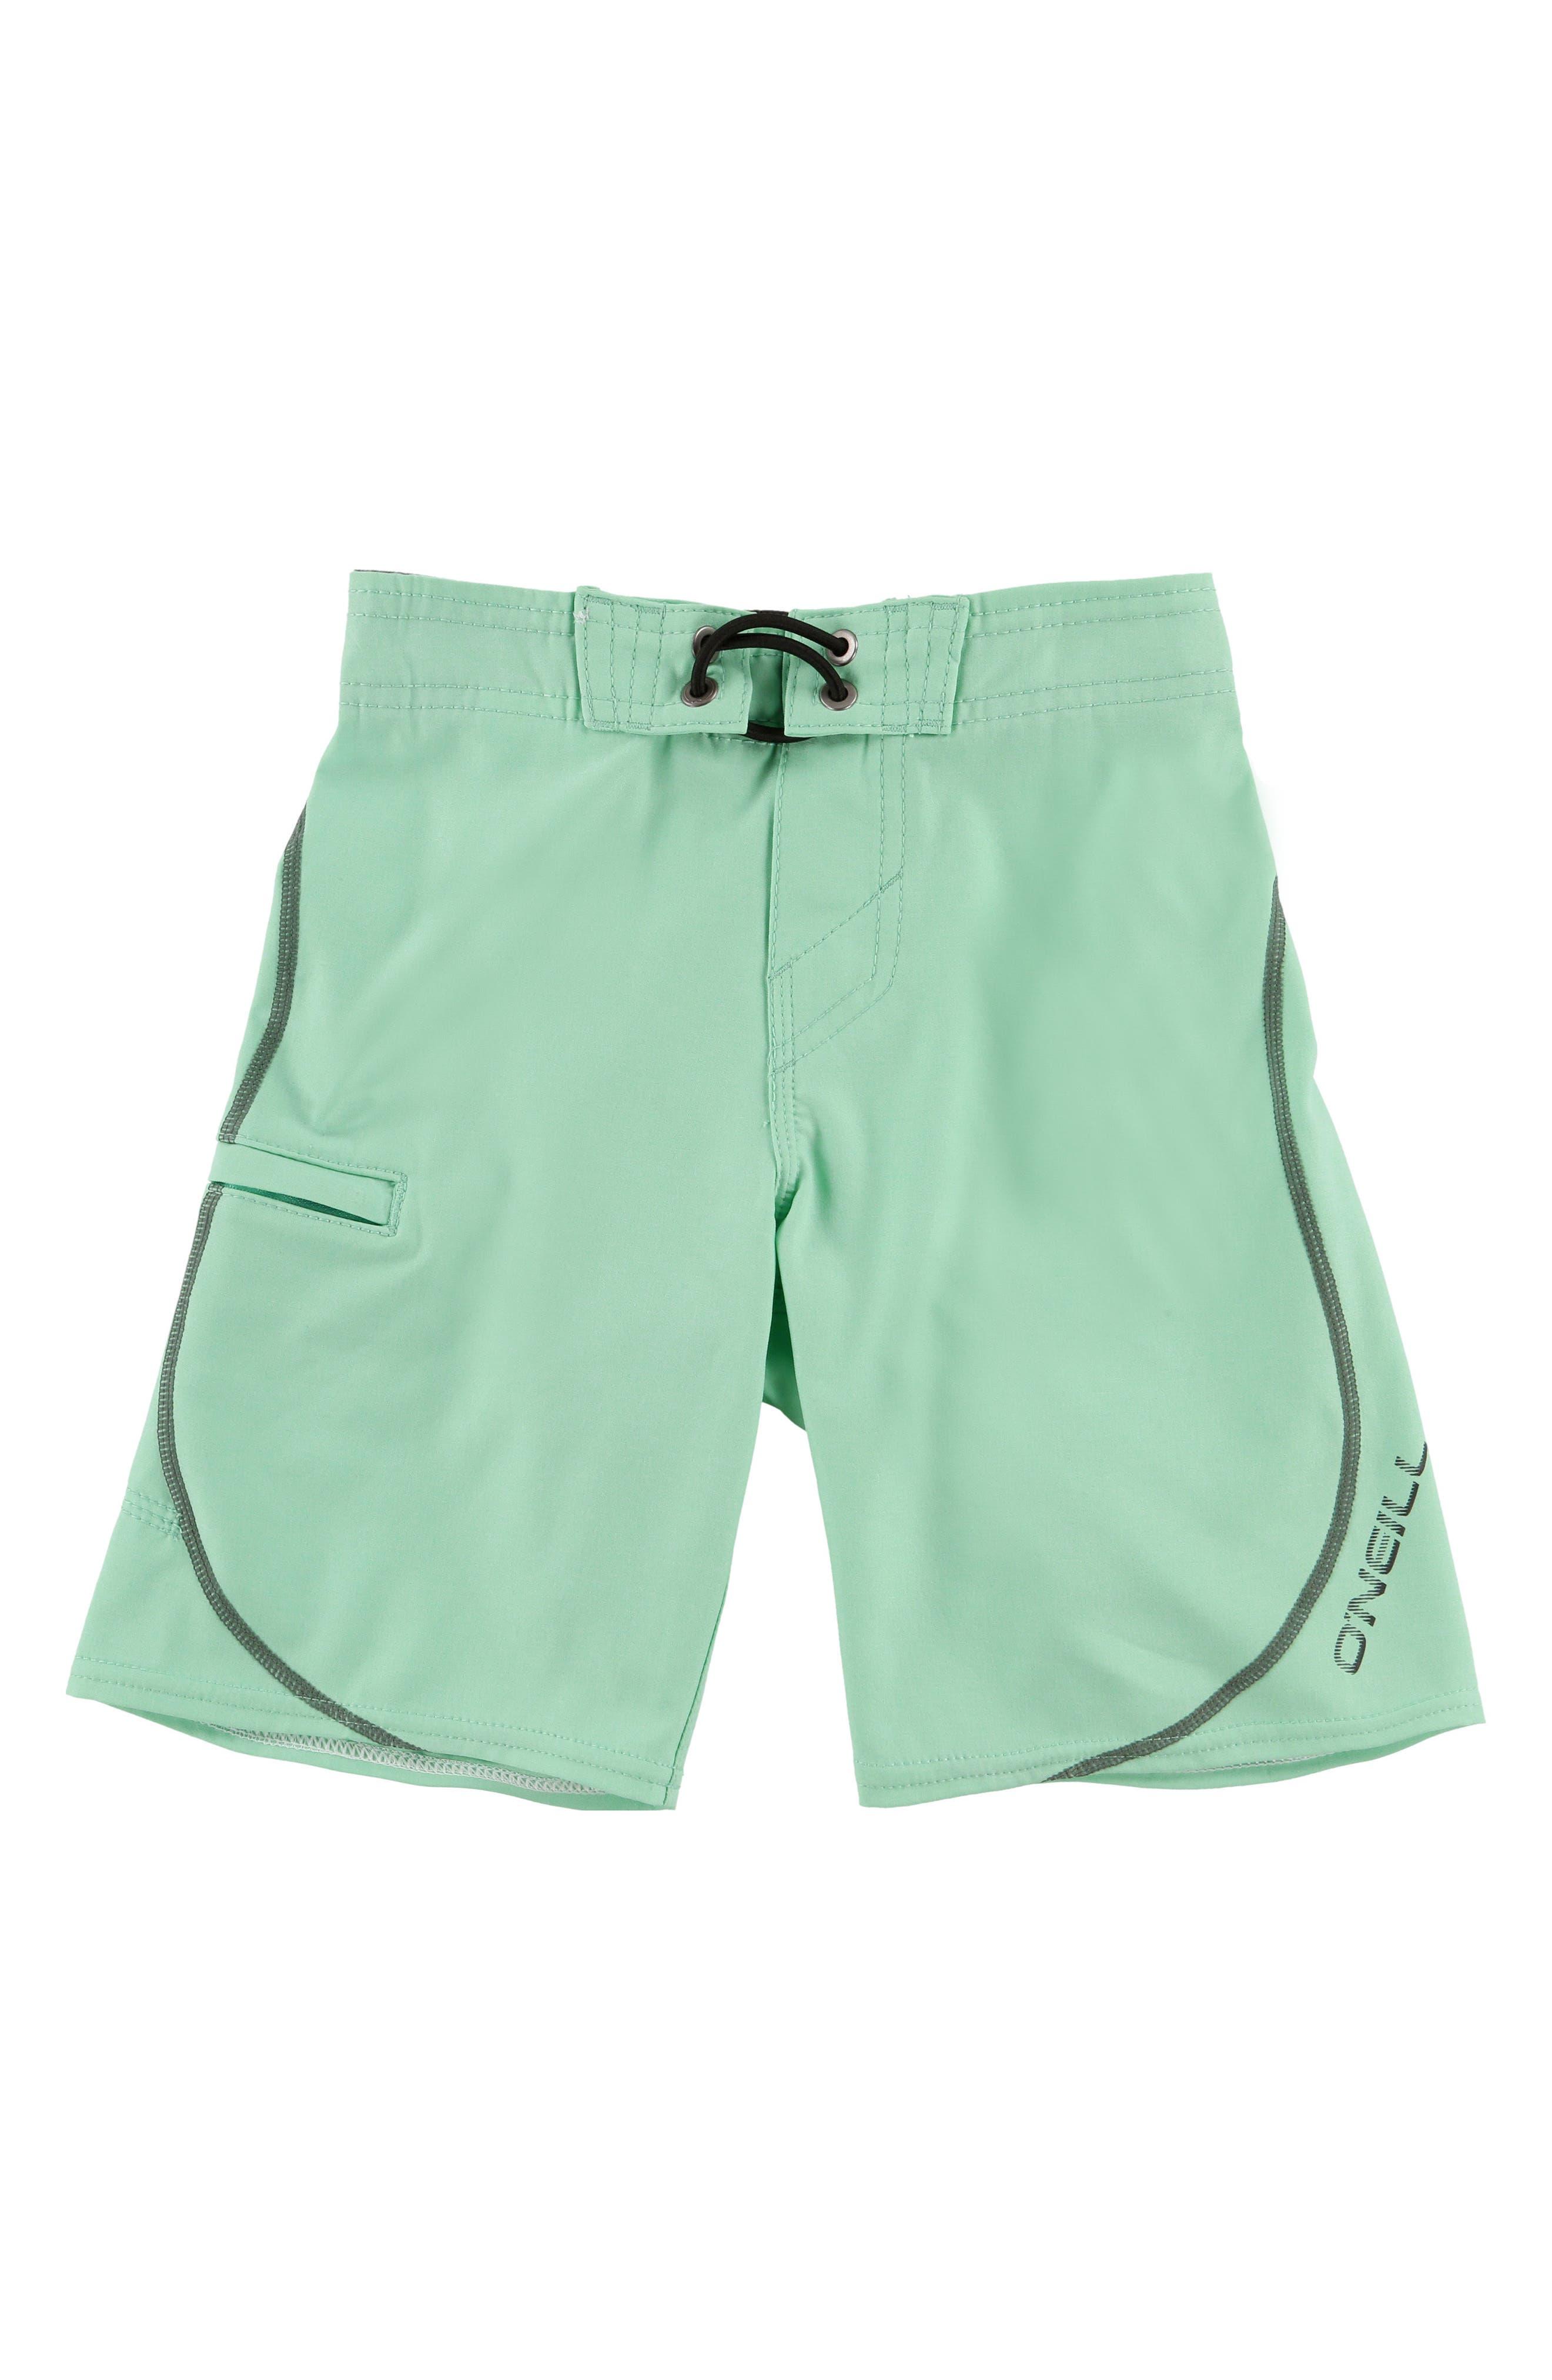 Hyperfreak S-Seam Stretch Board Shorts,                             Main thumbnail 3, color,